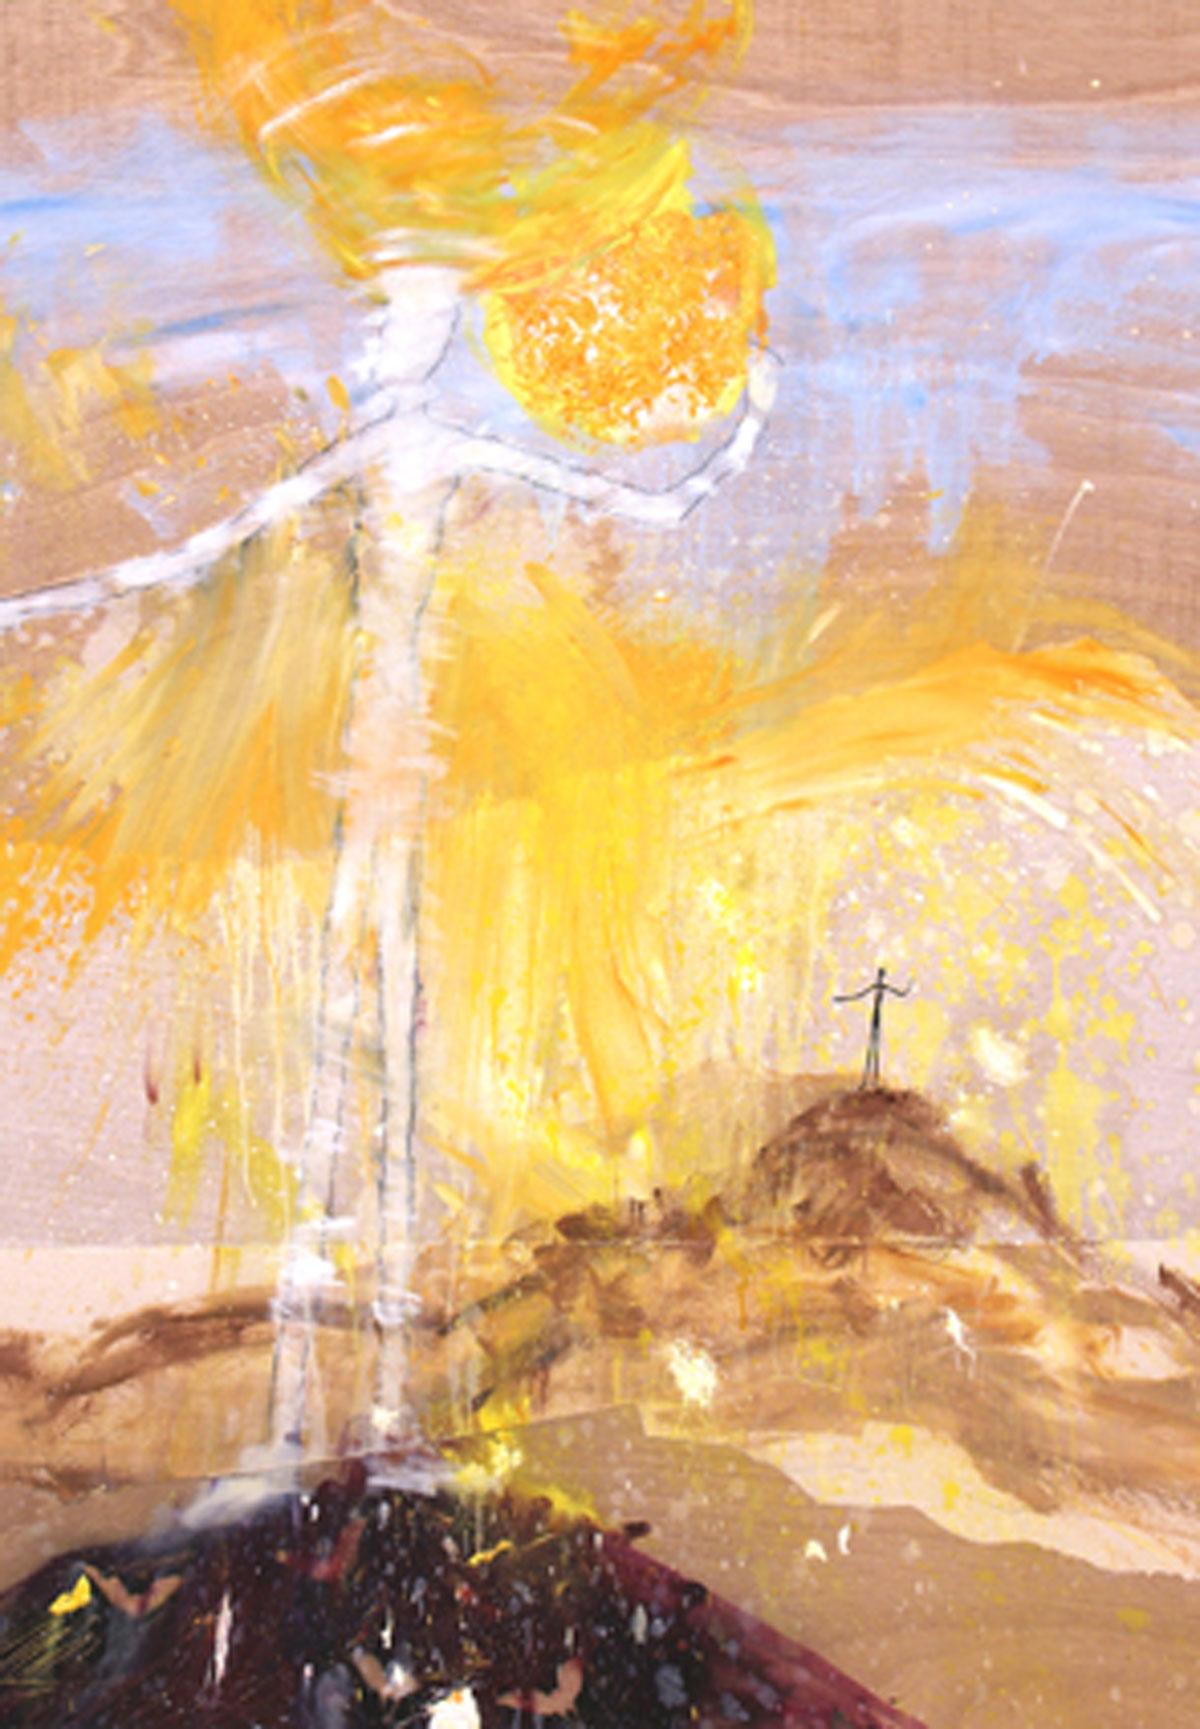 Jörg Länger, Christus-Sonnen-Studie, 2007